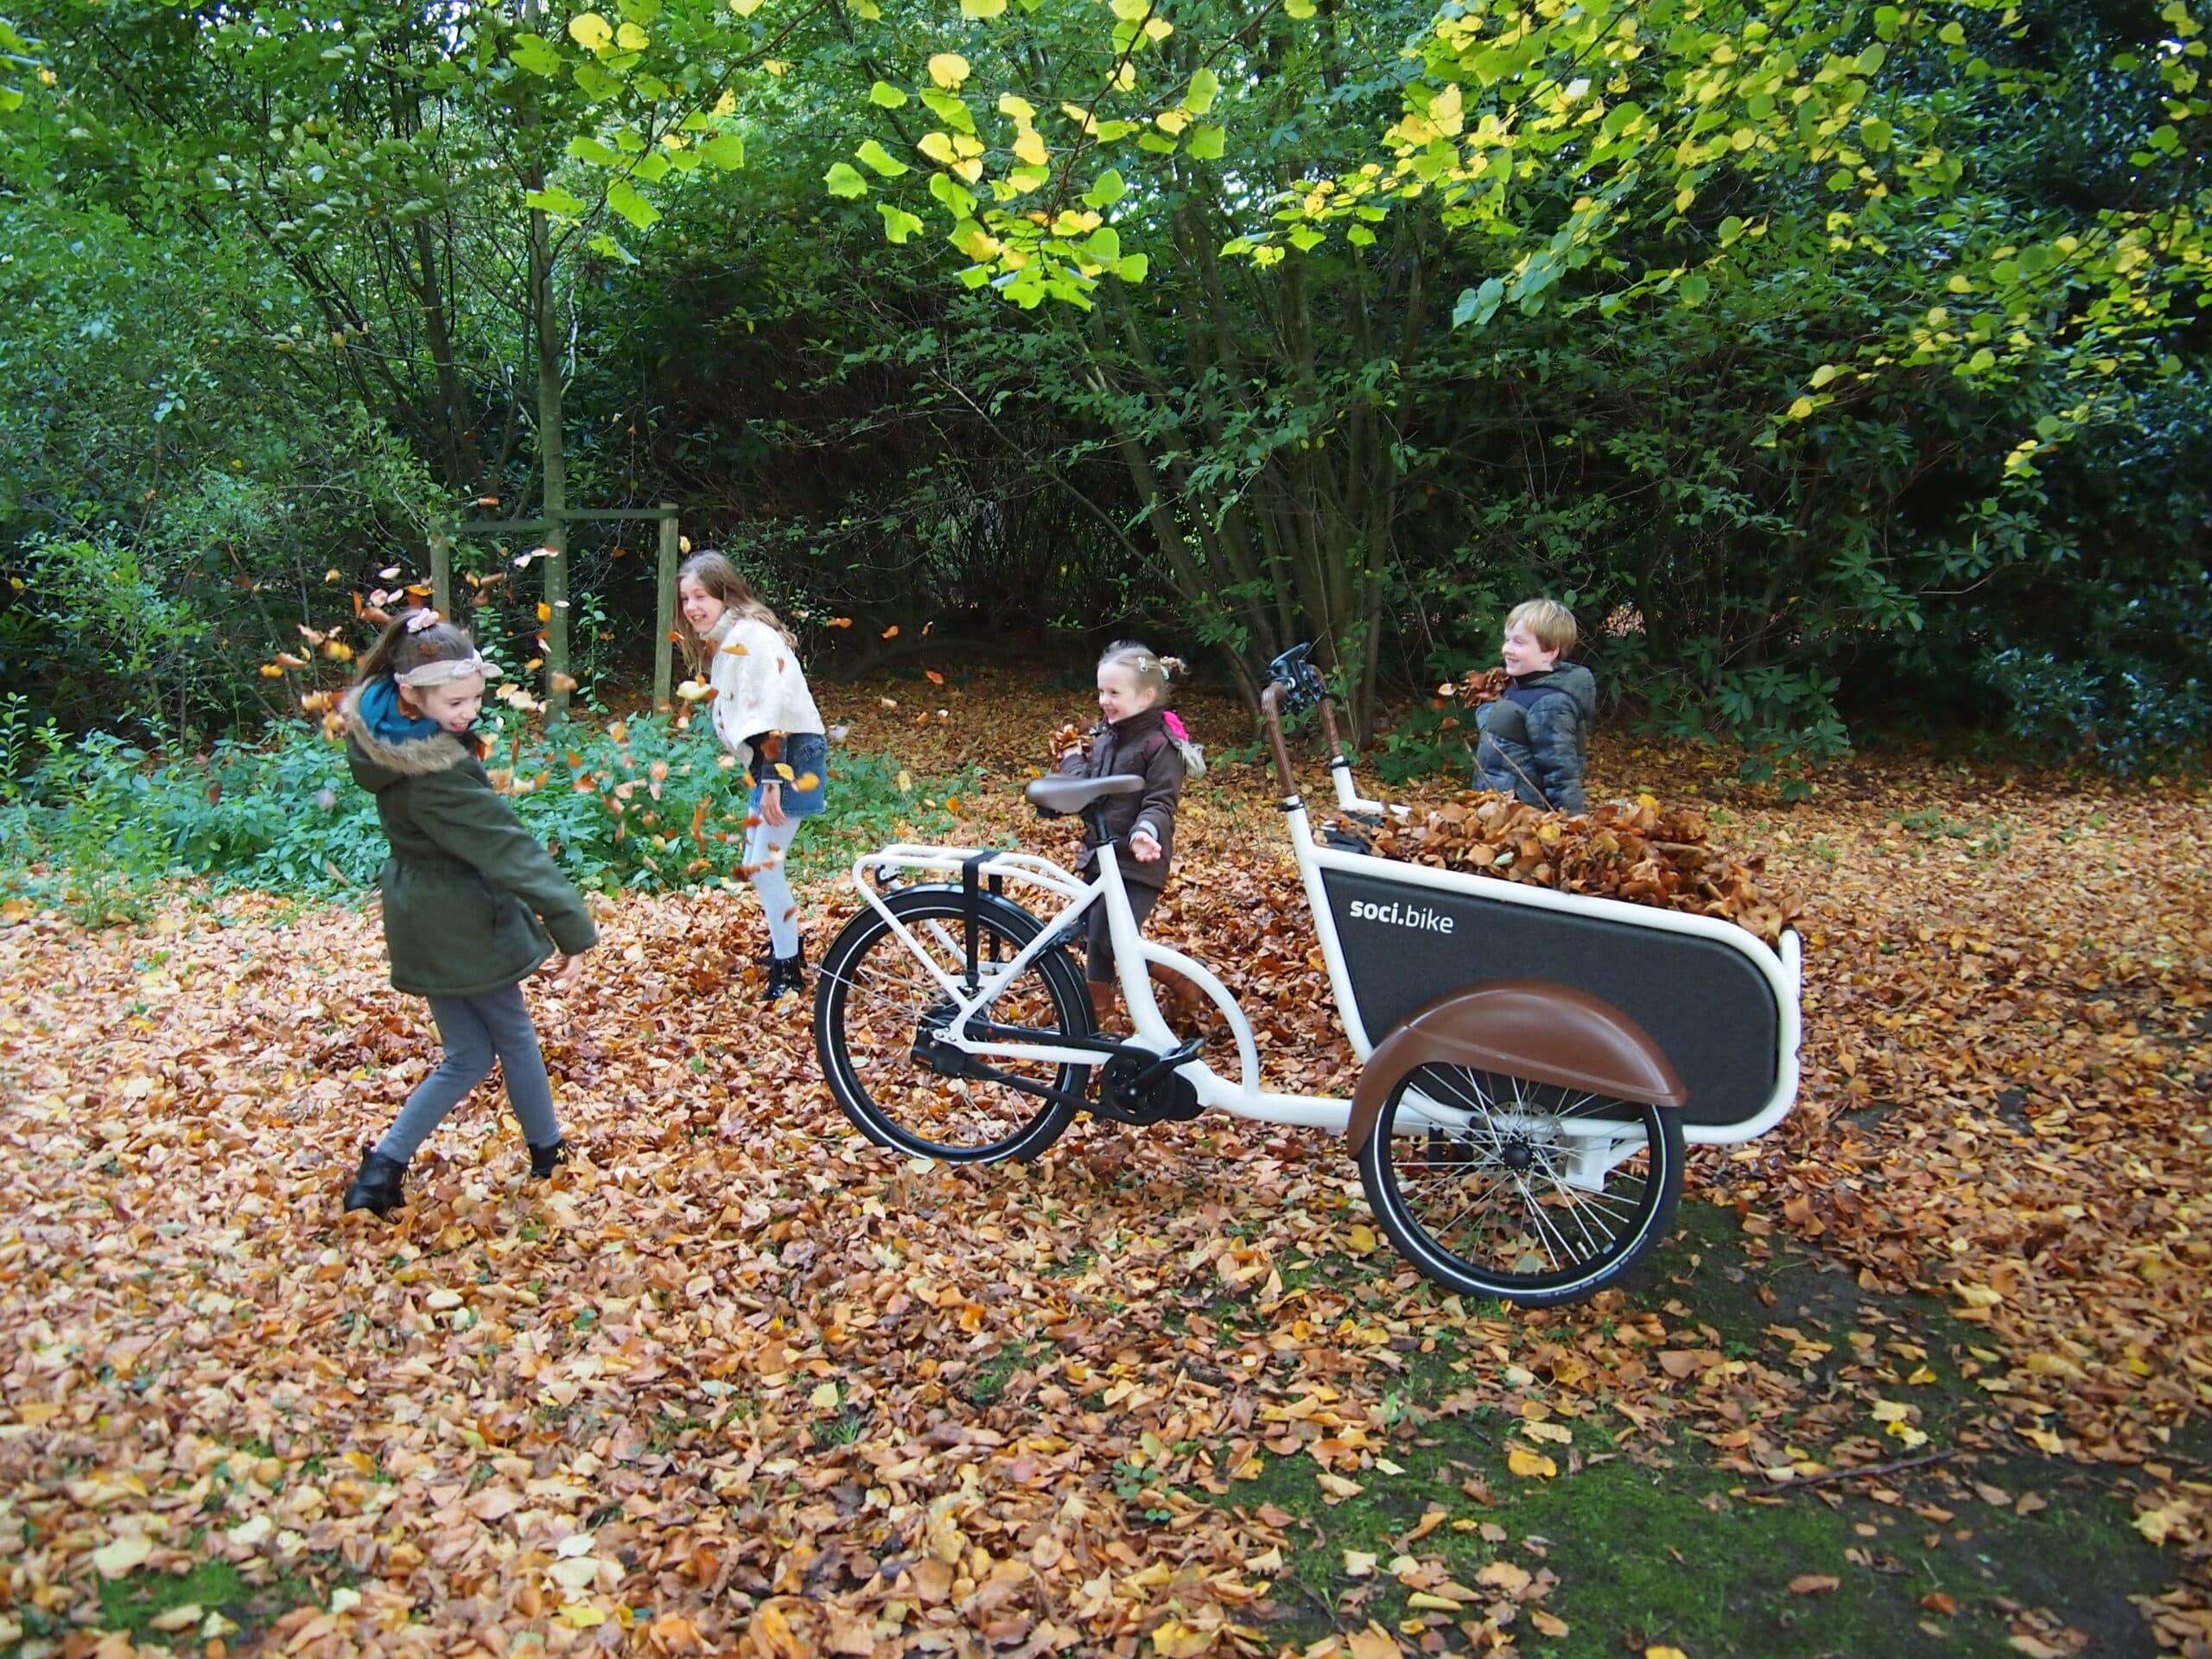 soci.bike bakfiets herfst herfstvakantie